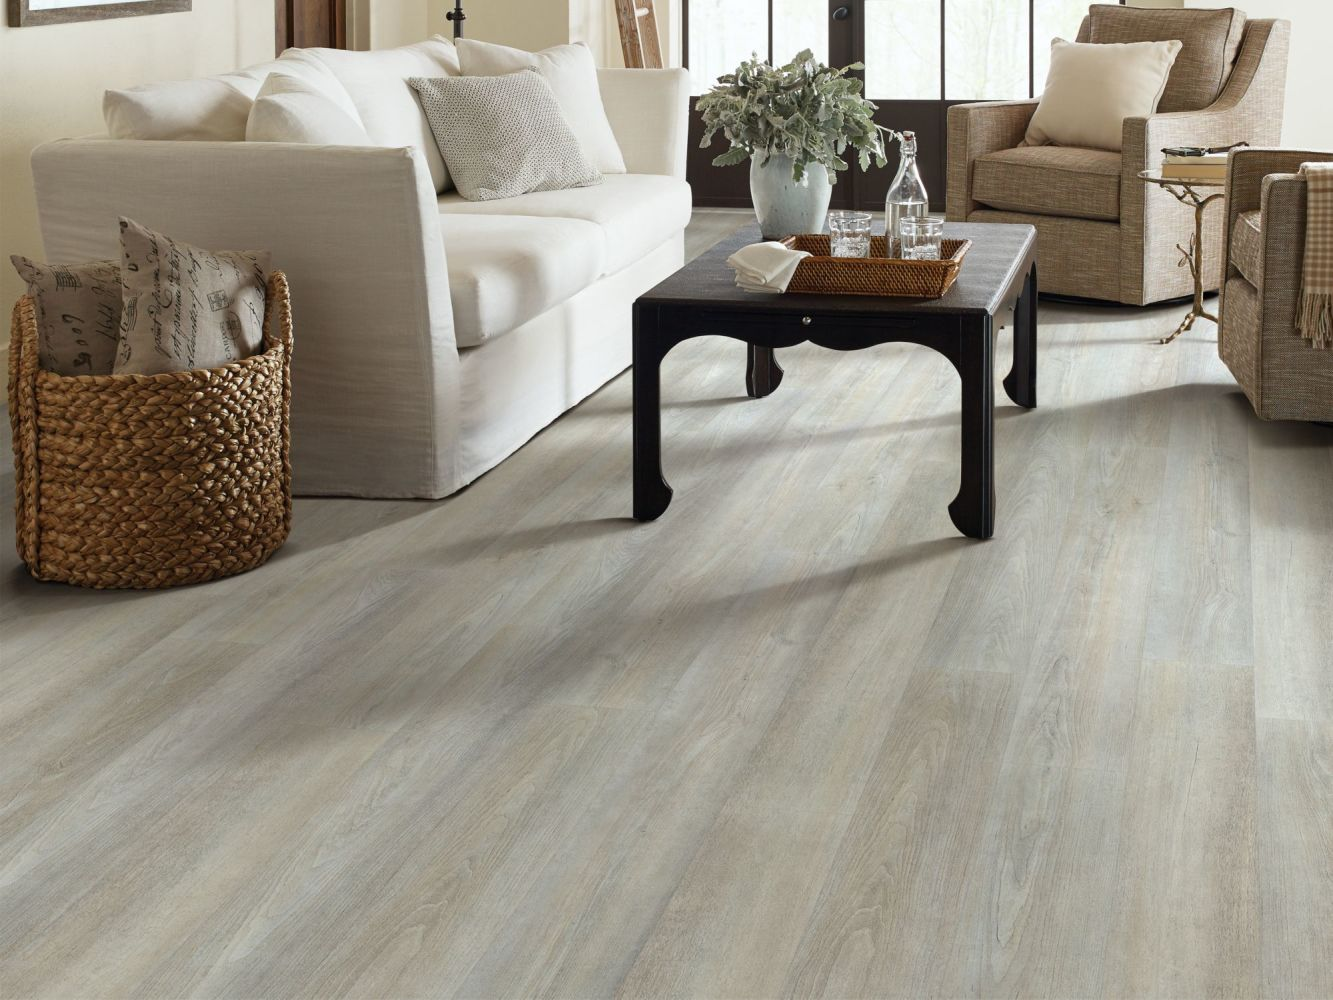 Shaw Floors Setup Greige Walnut 05078_5M402